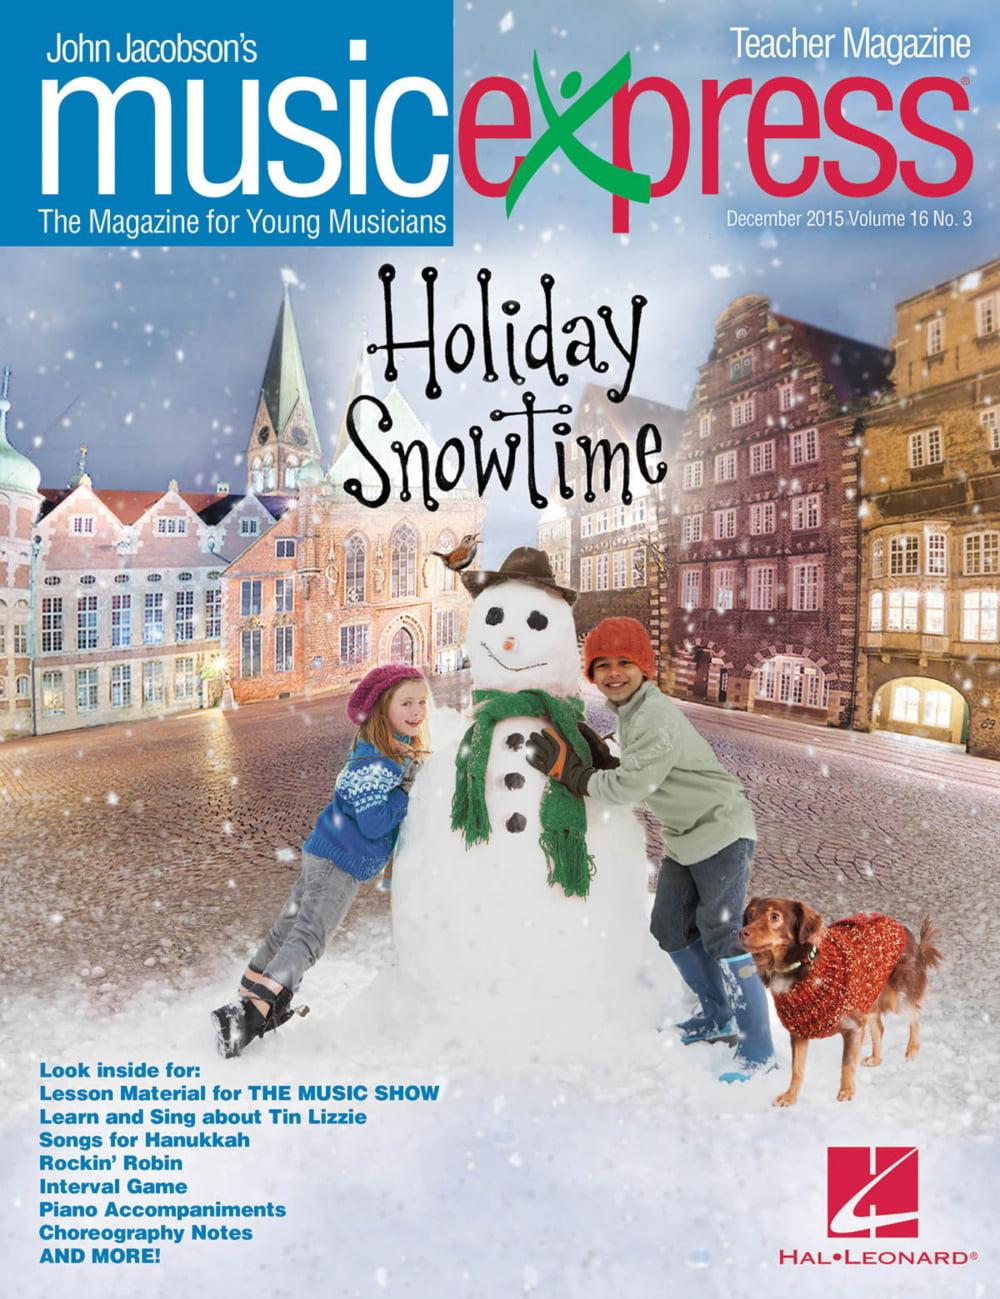 Hal Leonard Holiday Snowtime Vol. 16 No. 3 (December 2015) Teacher Magazine w CD Arranged... by Hal Leonard